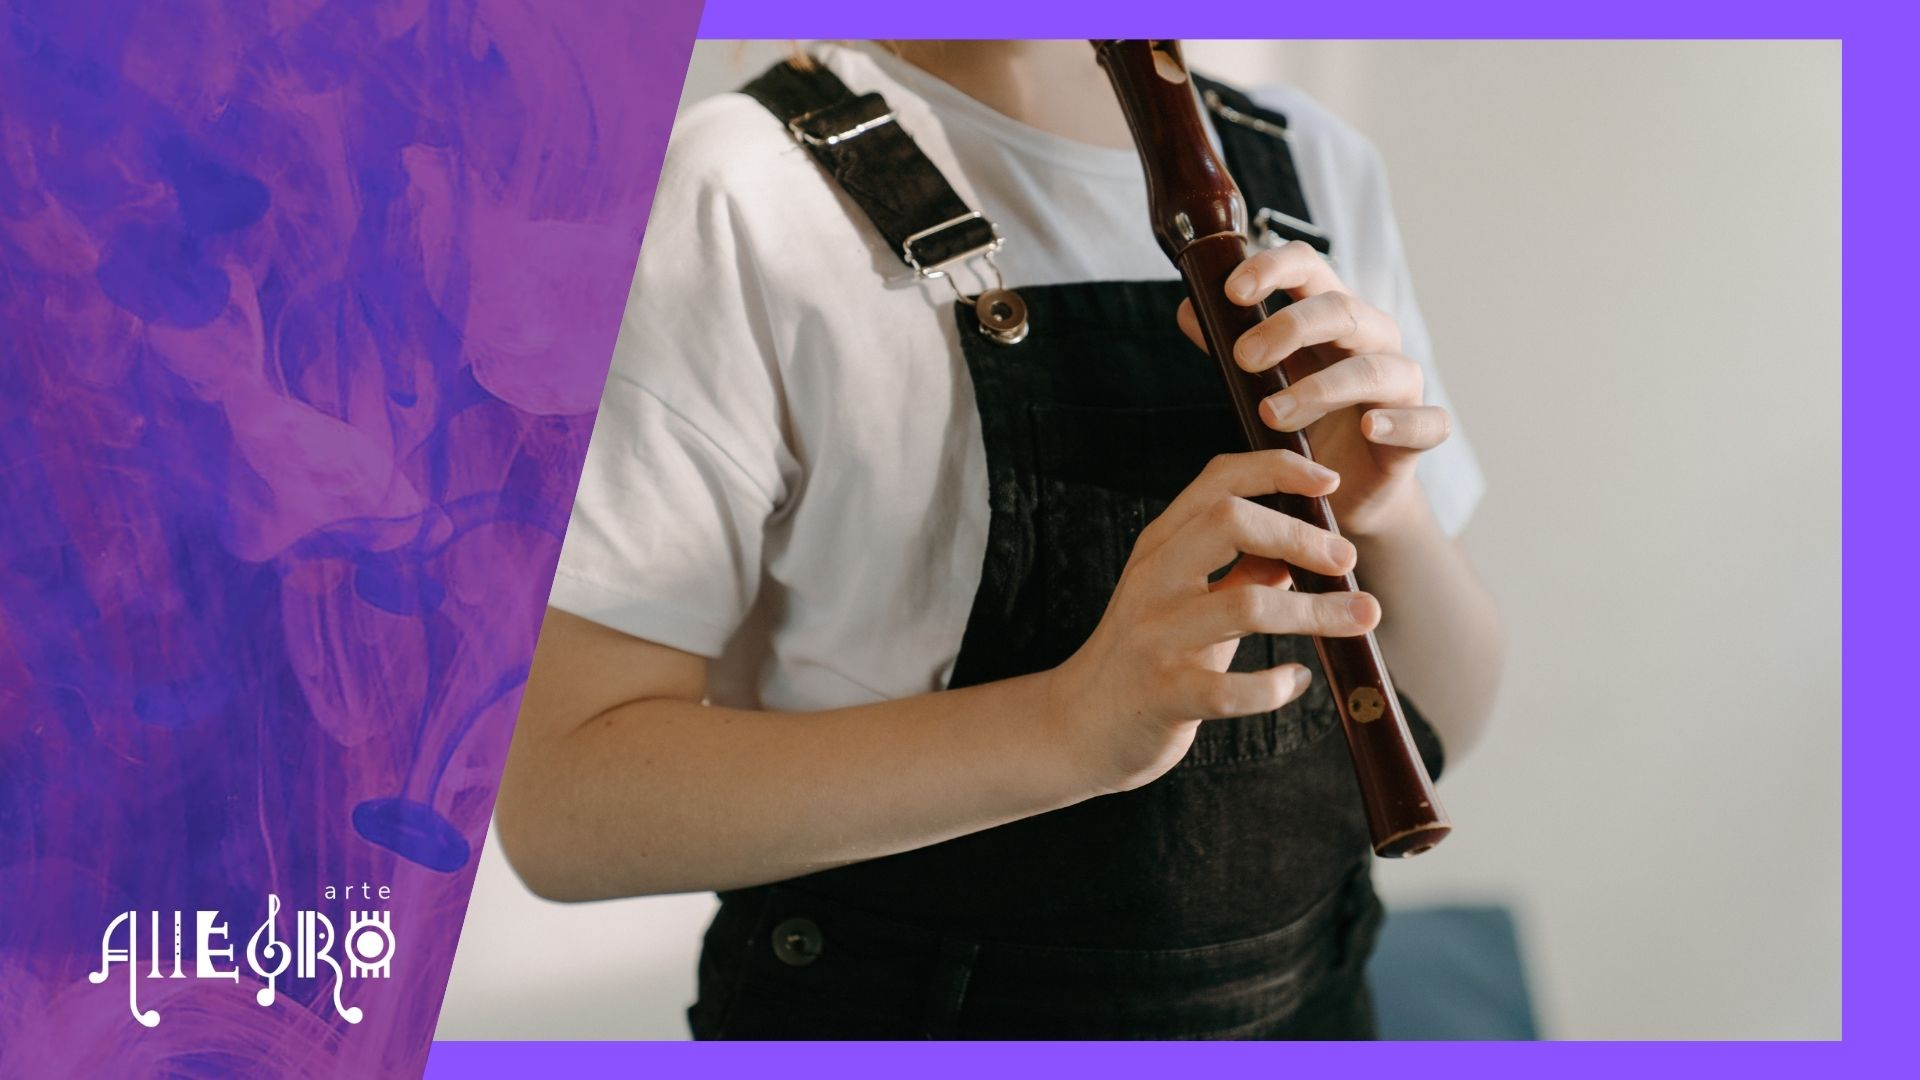 flauta dulce blog arte allegro musicaonline